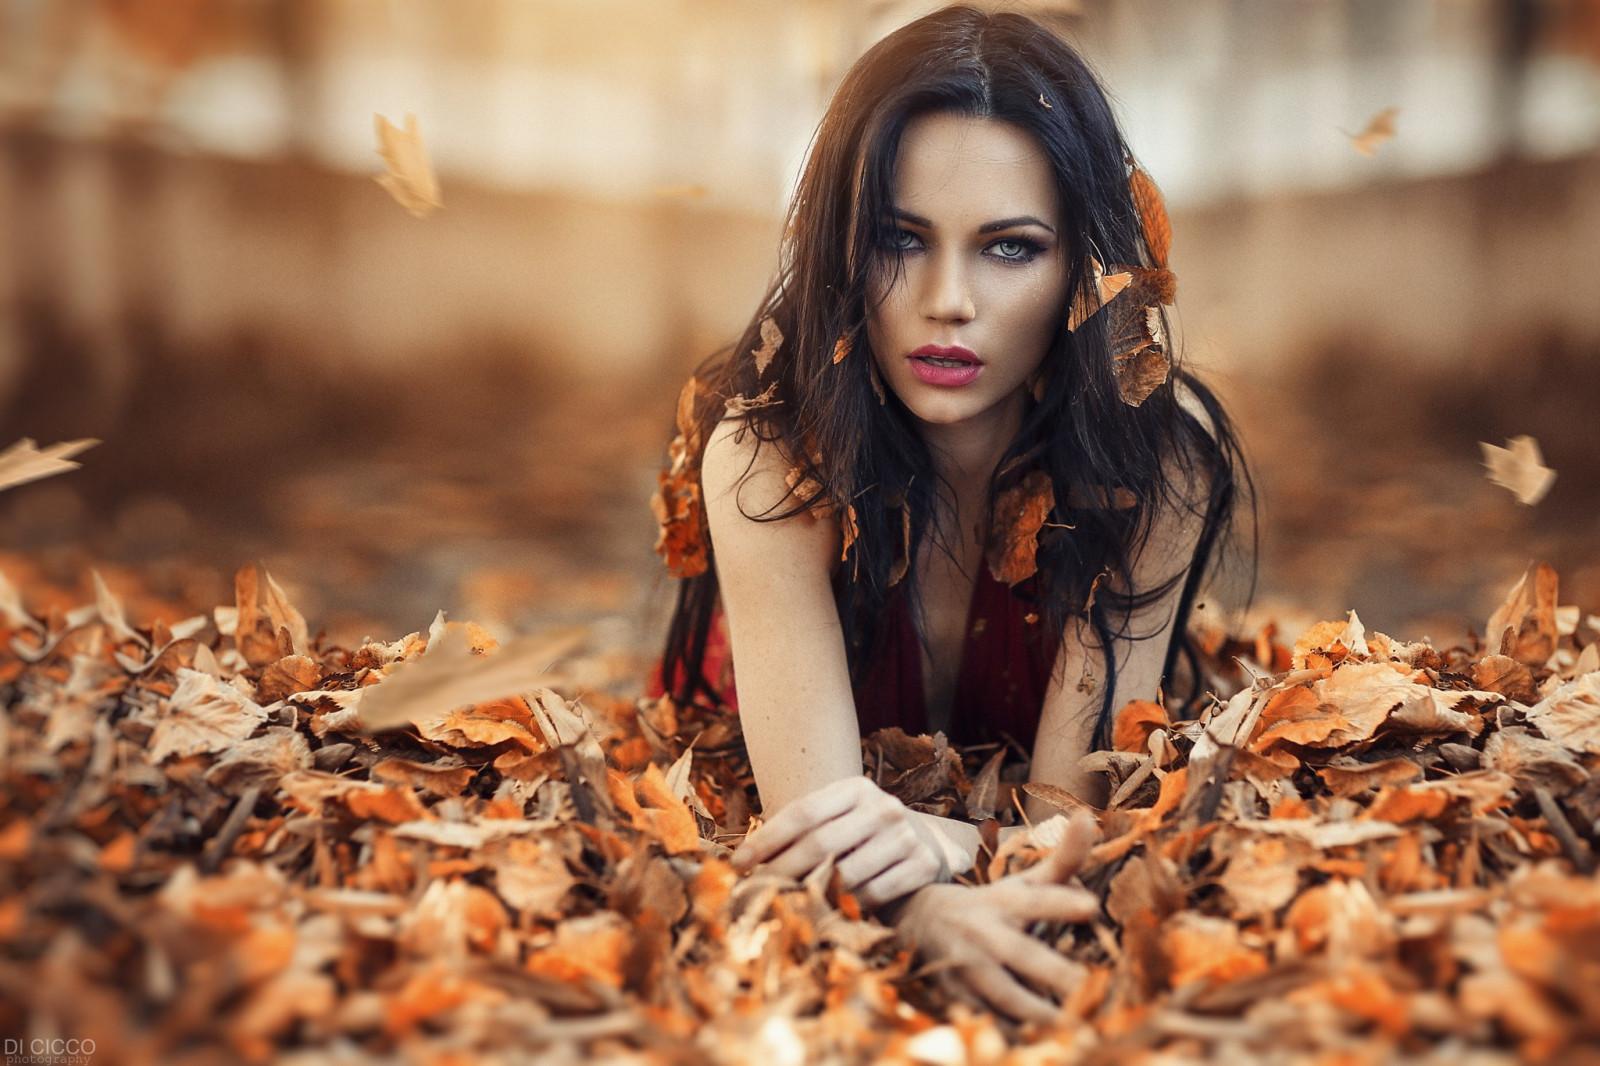 eyes, Long hair, Hair in face, Women outdoors, Georgiy